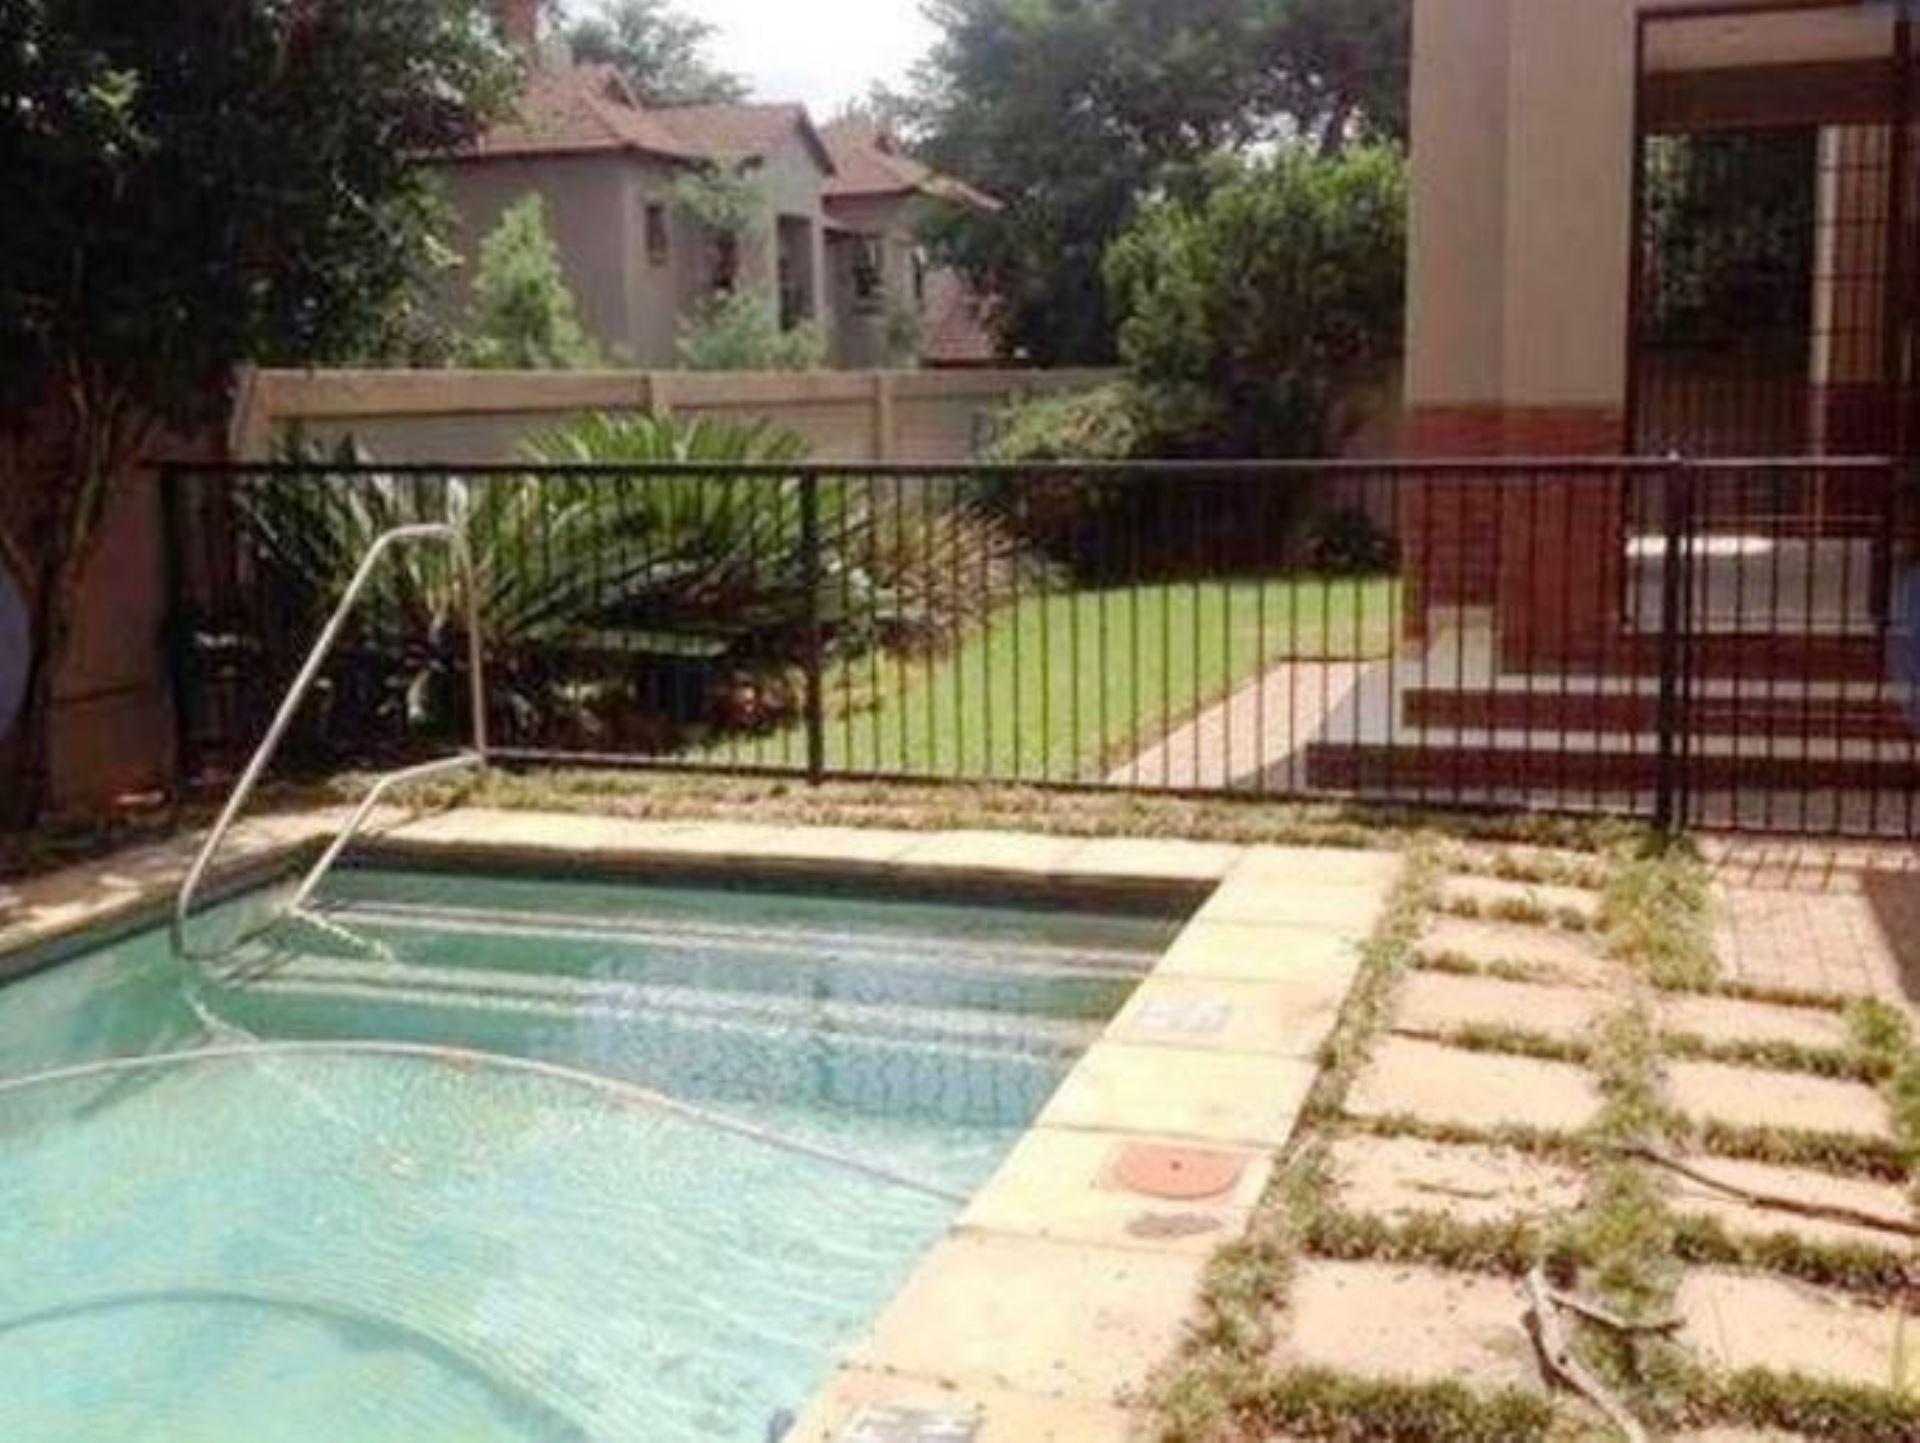 House Rental Monthly in MENLO PARK